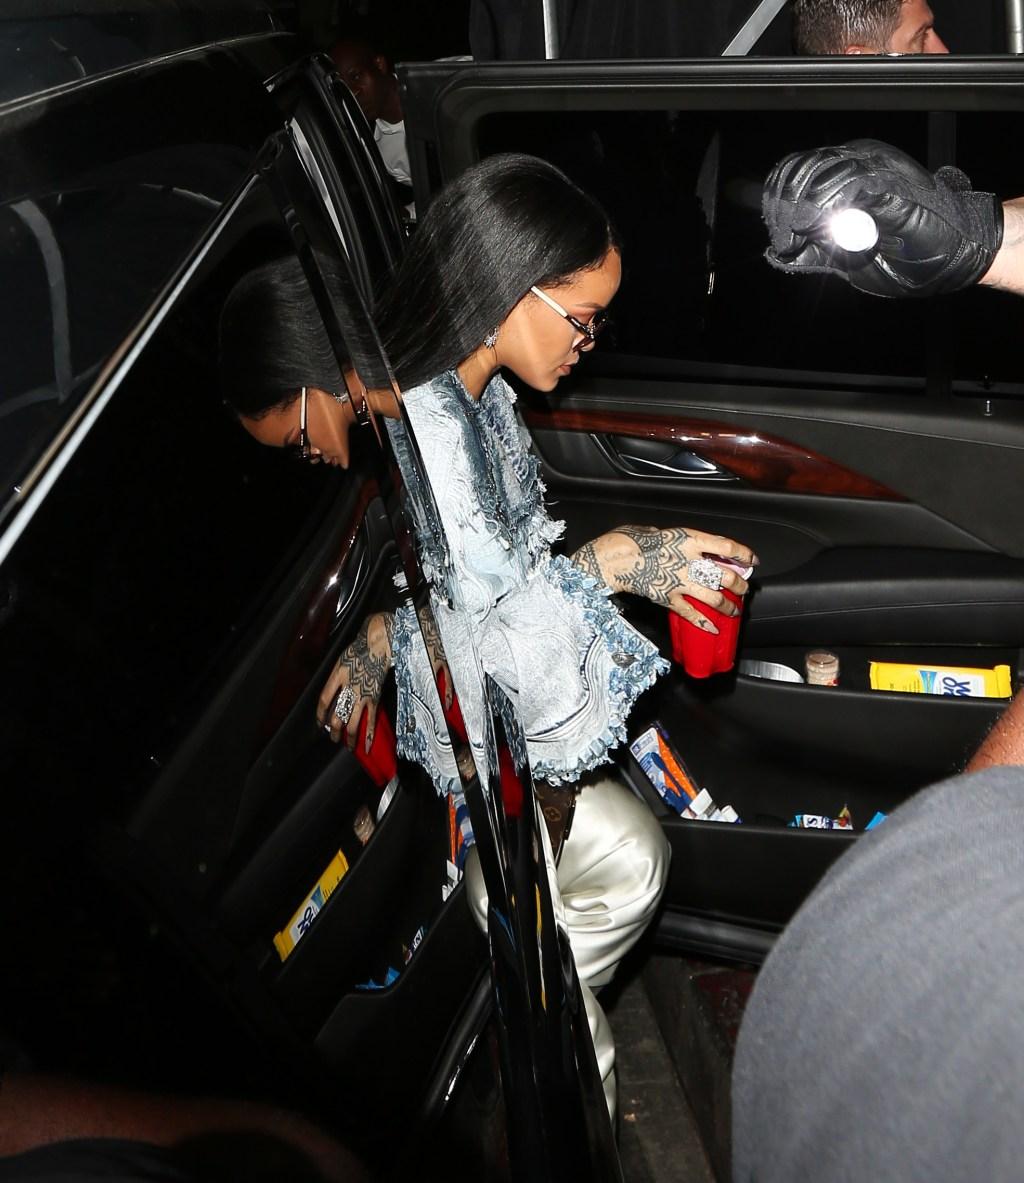 Drake and Rihanna arrive at The Nice Guy restaurant